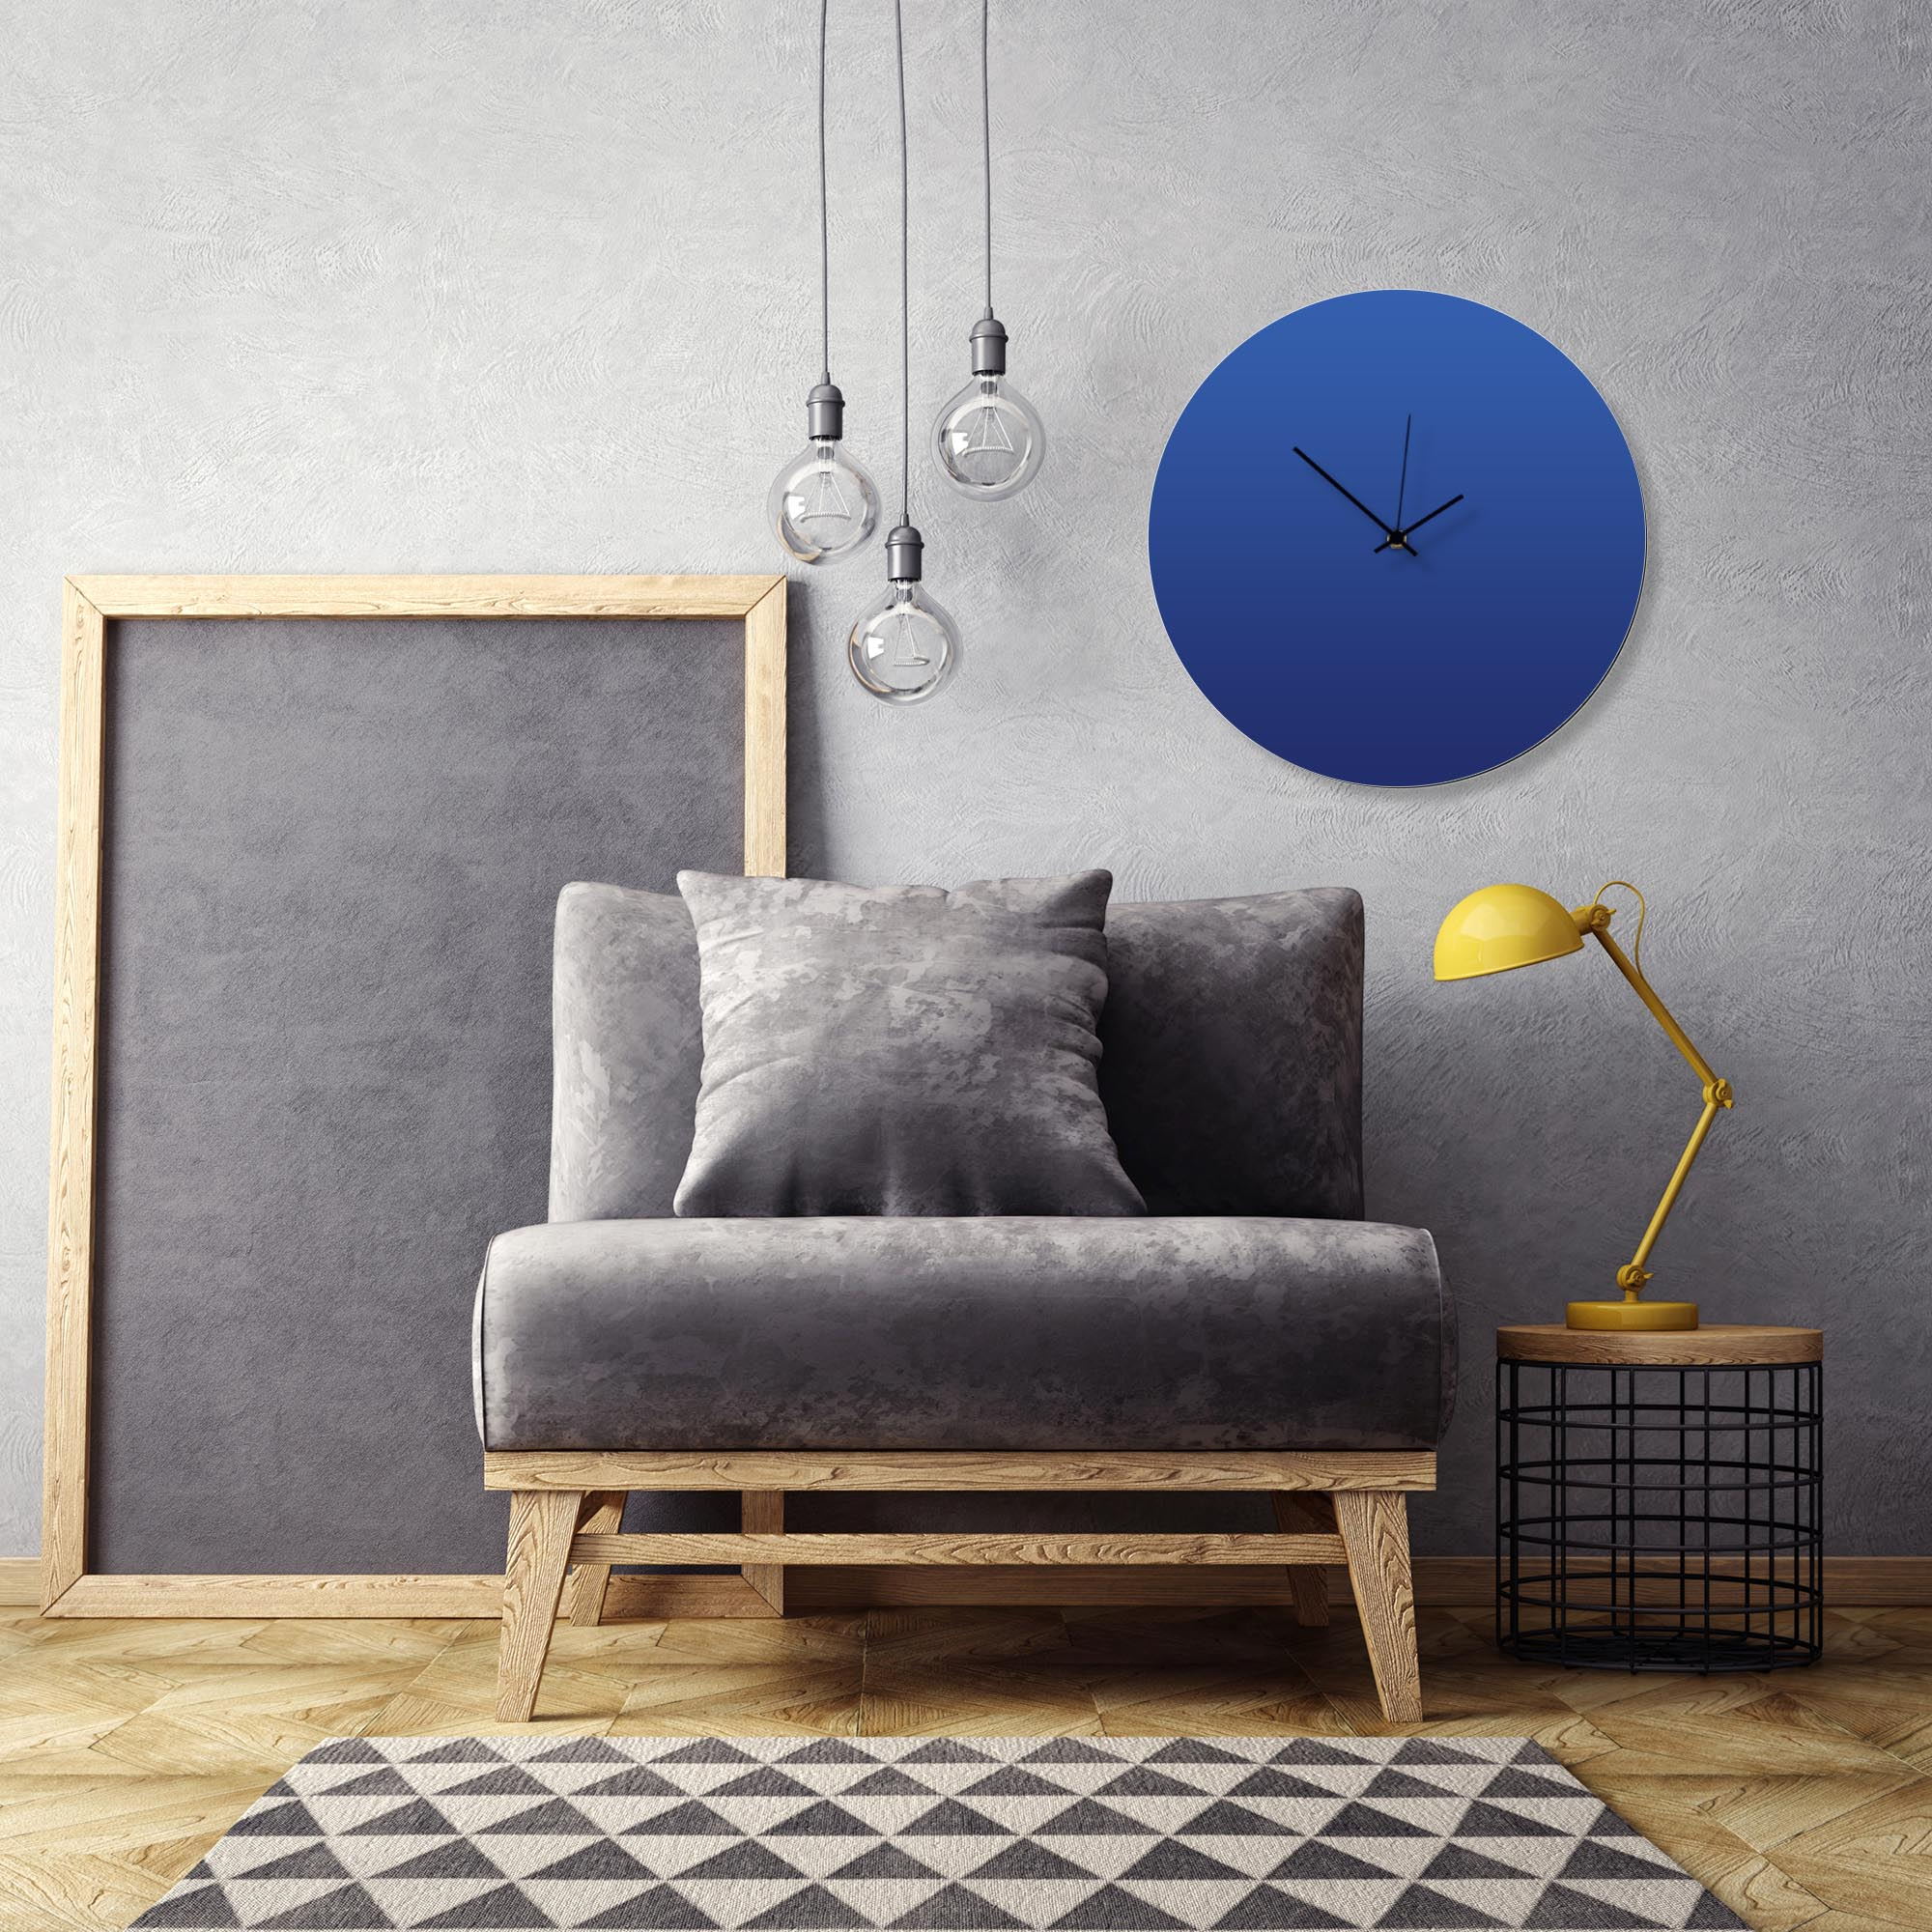 Blueout Black Circle Clock Large by Adam Schwoeppe Contemporary Clock on Aluminum Polymetal - Alternate View 1